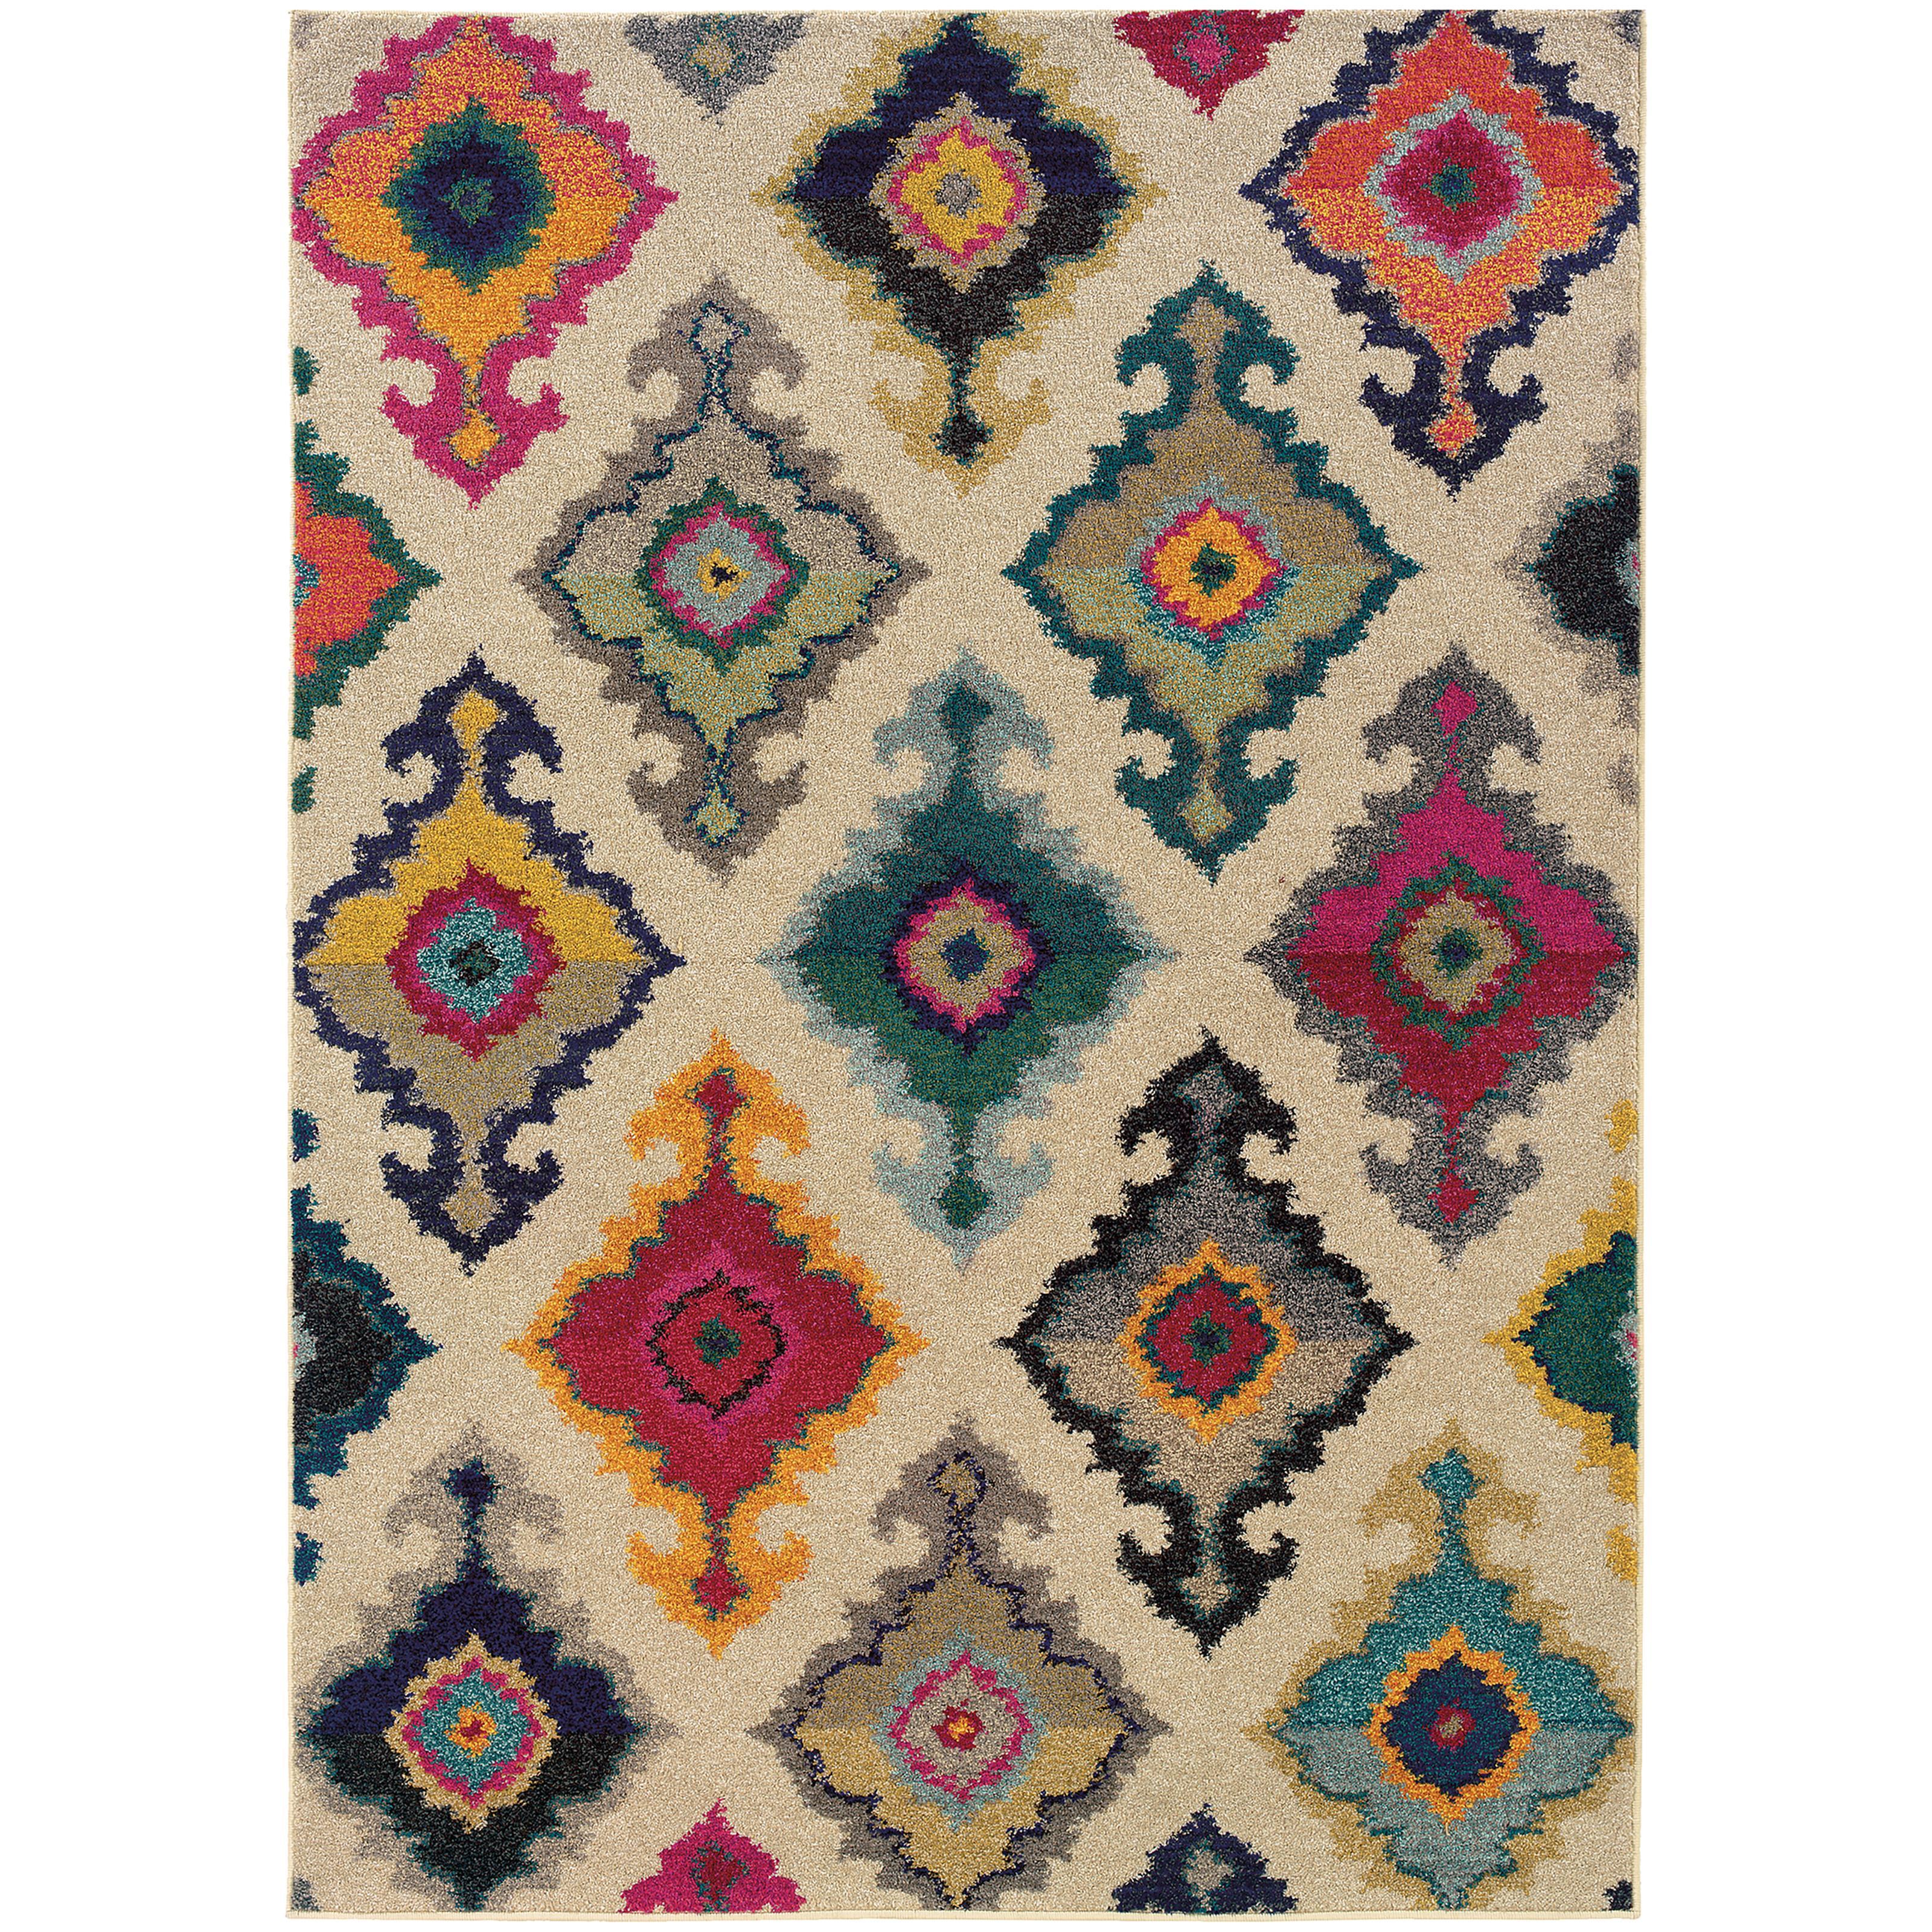 "Kaleidoscope 9' 9"" X 12' 2"" Rug by Oriental Weavers at Steger's Furniture"